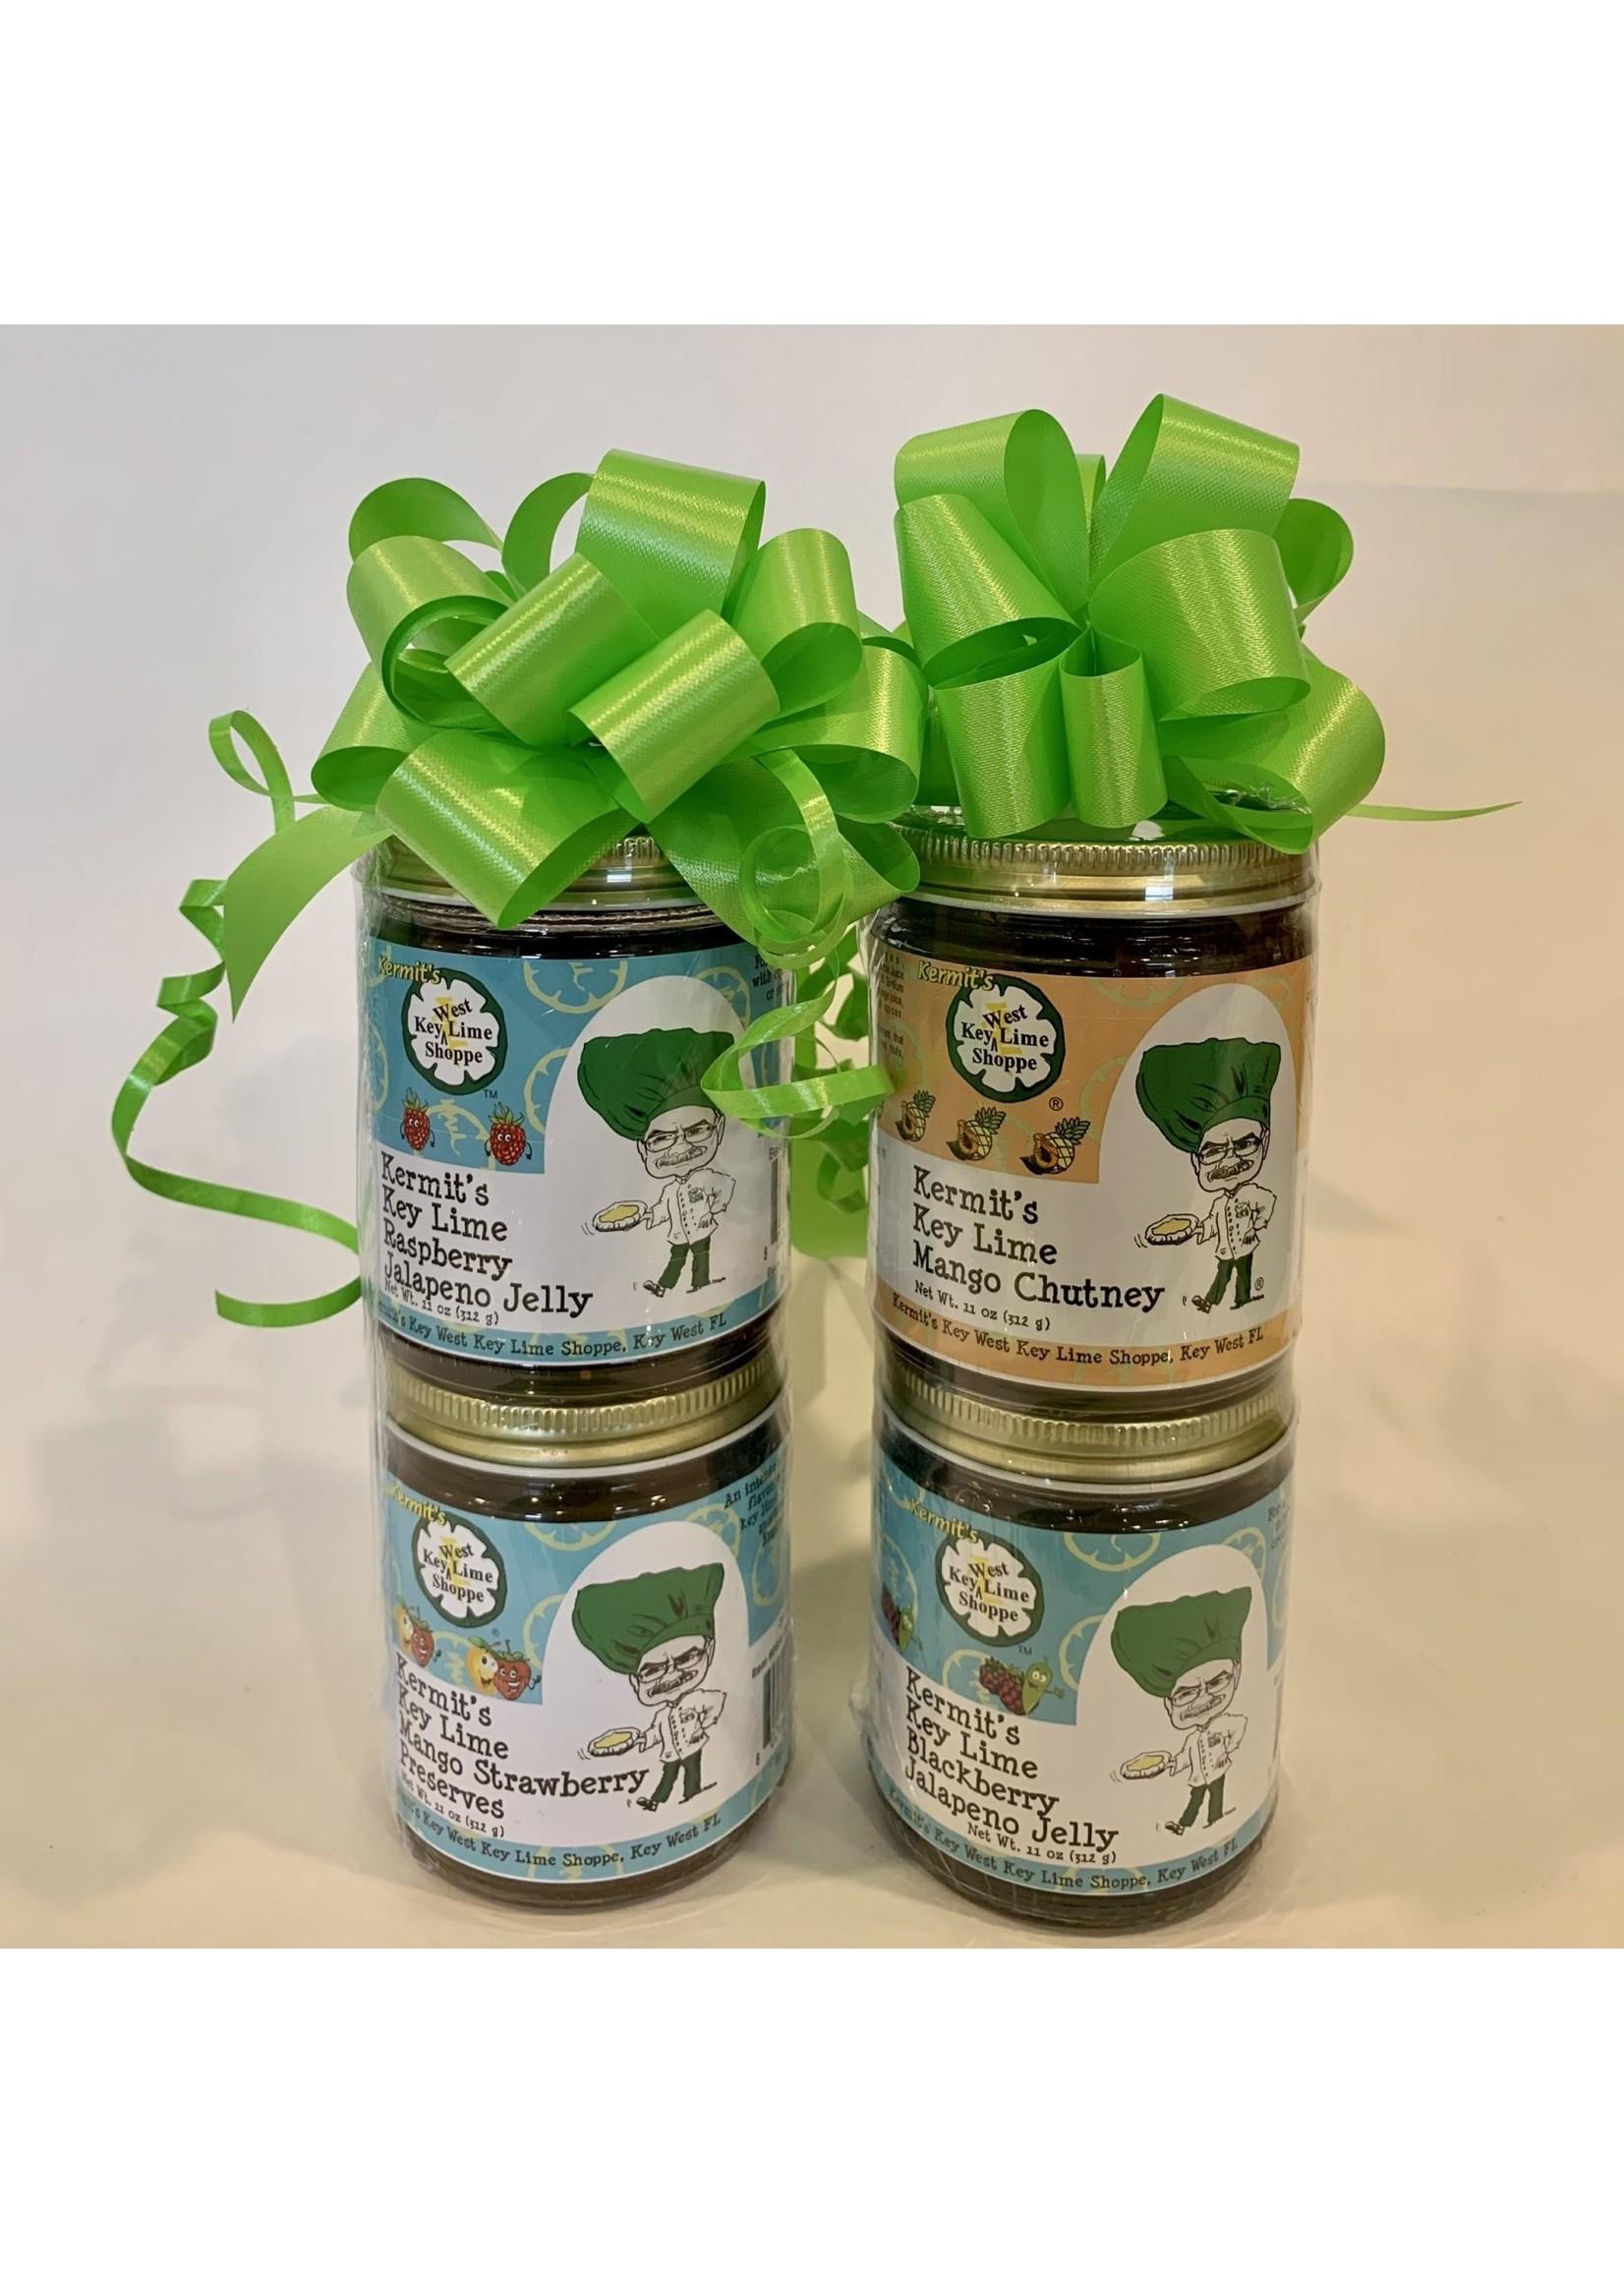 Kermit's Key Lime Jelly Duo - Mango Strawberry Preserves & Raspberry Jalapeno Jelly